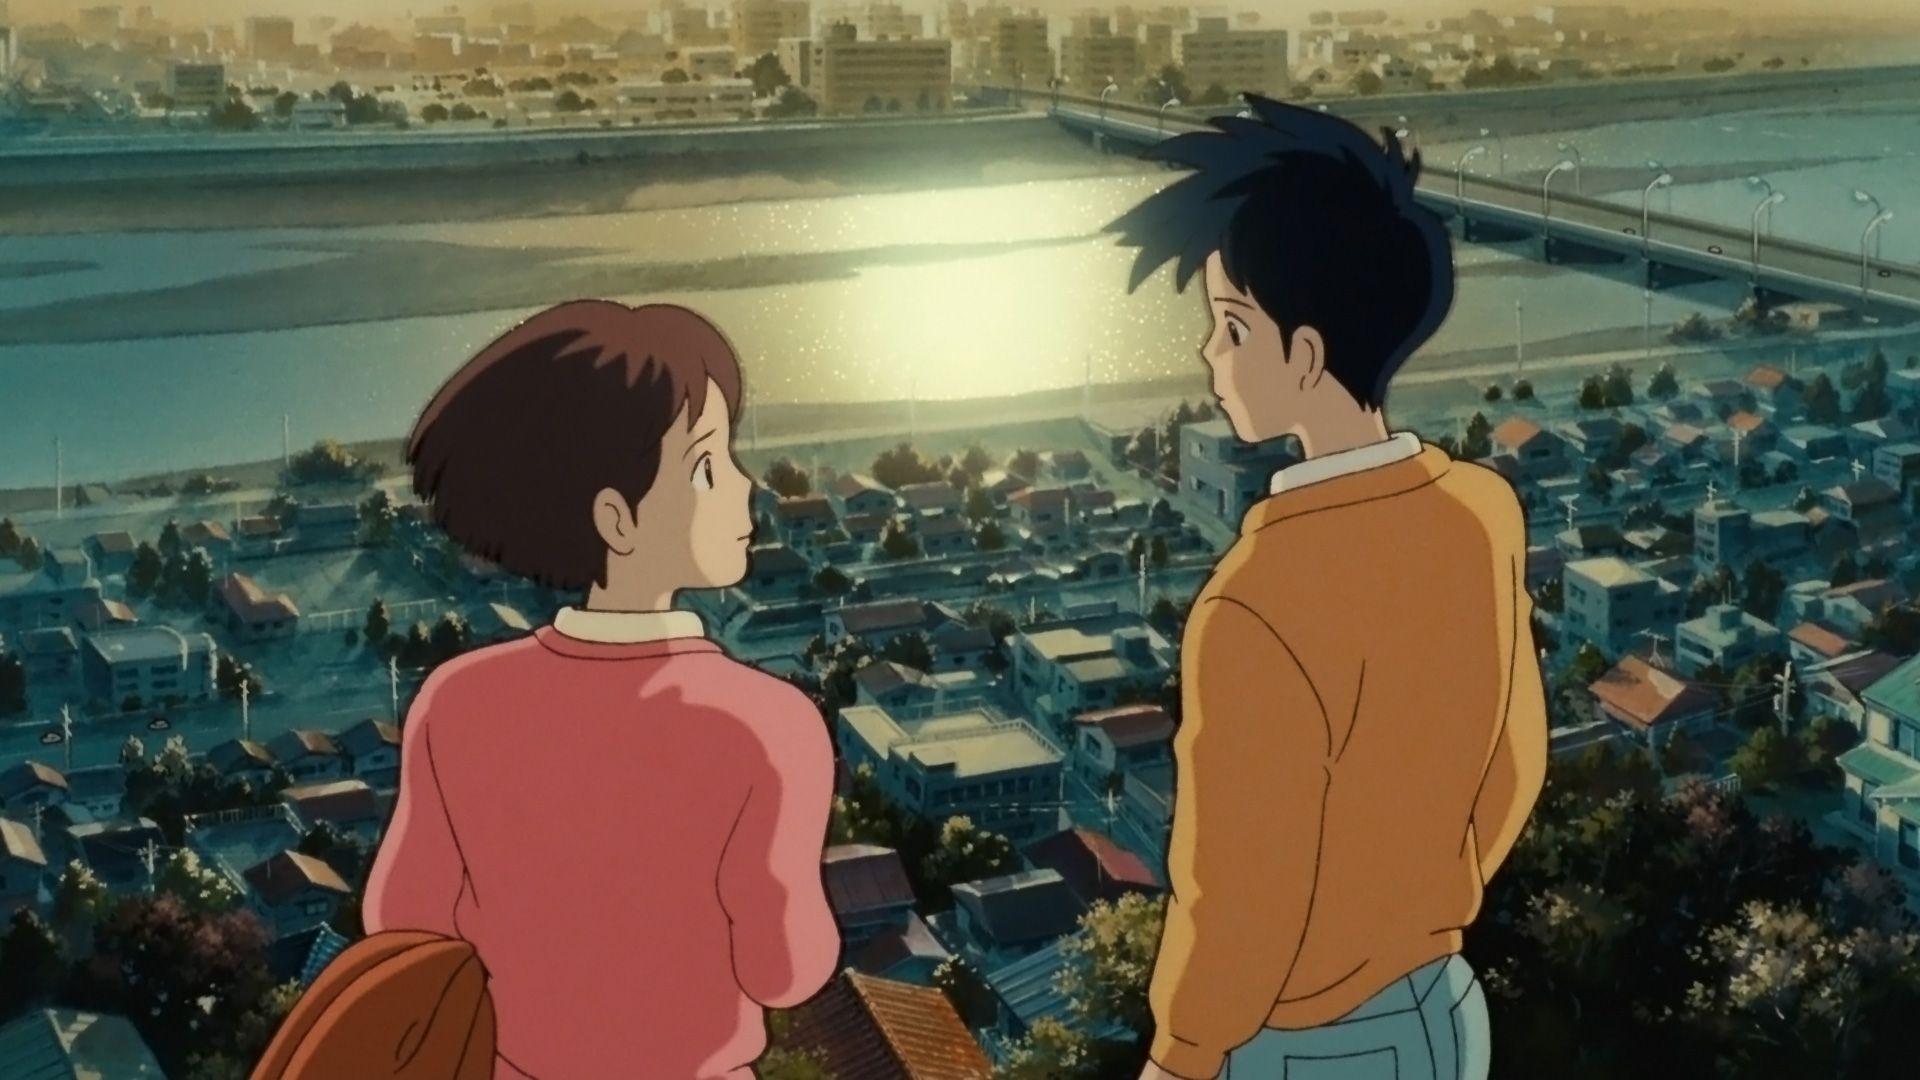 Whisper Of The Heart Wallpapers in 2020 Aesthetic anime